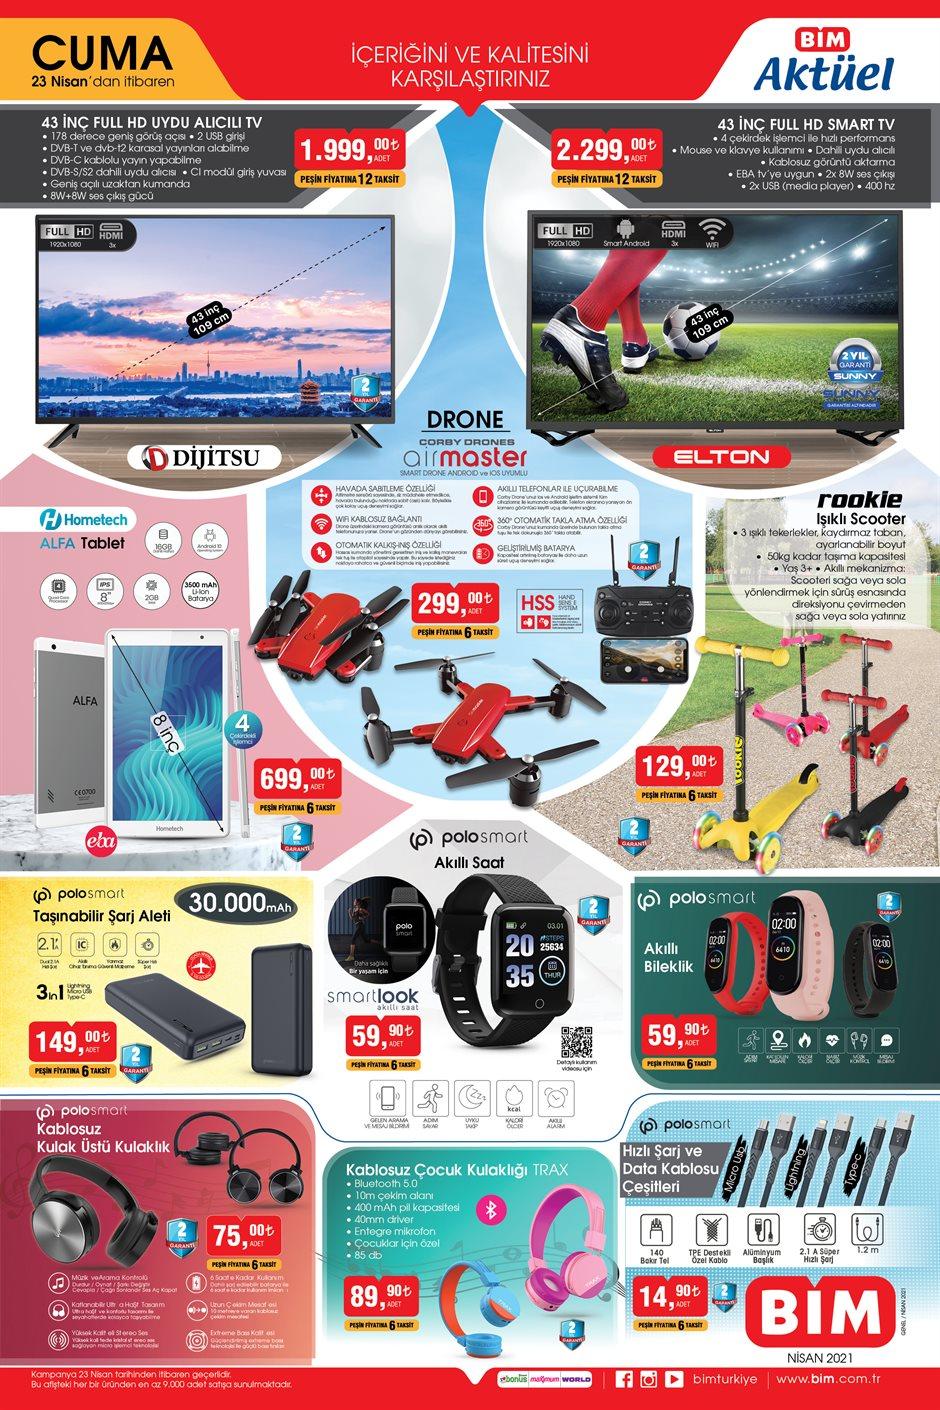 afis W3Y30JD4 150 23 nisan drone - العديد من الأجهزة الإلكترونية والعروض المميزة في متجر بيــم BİM يوم الجمعة 23.04.2021